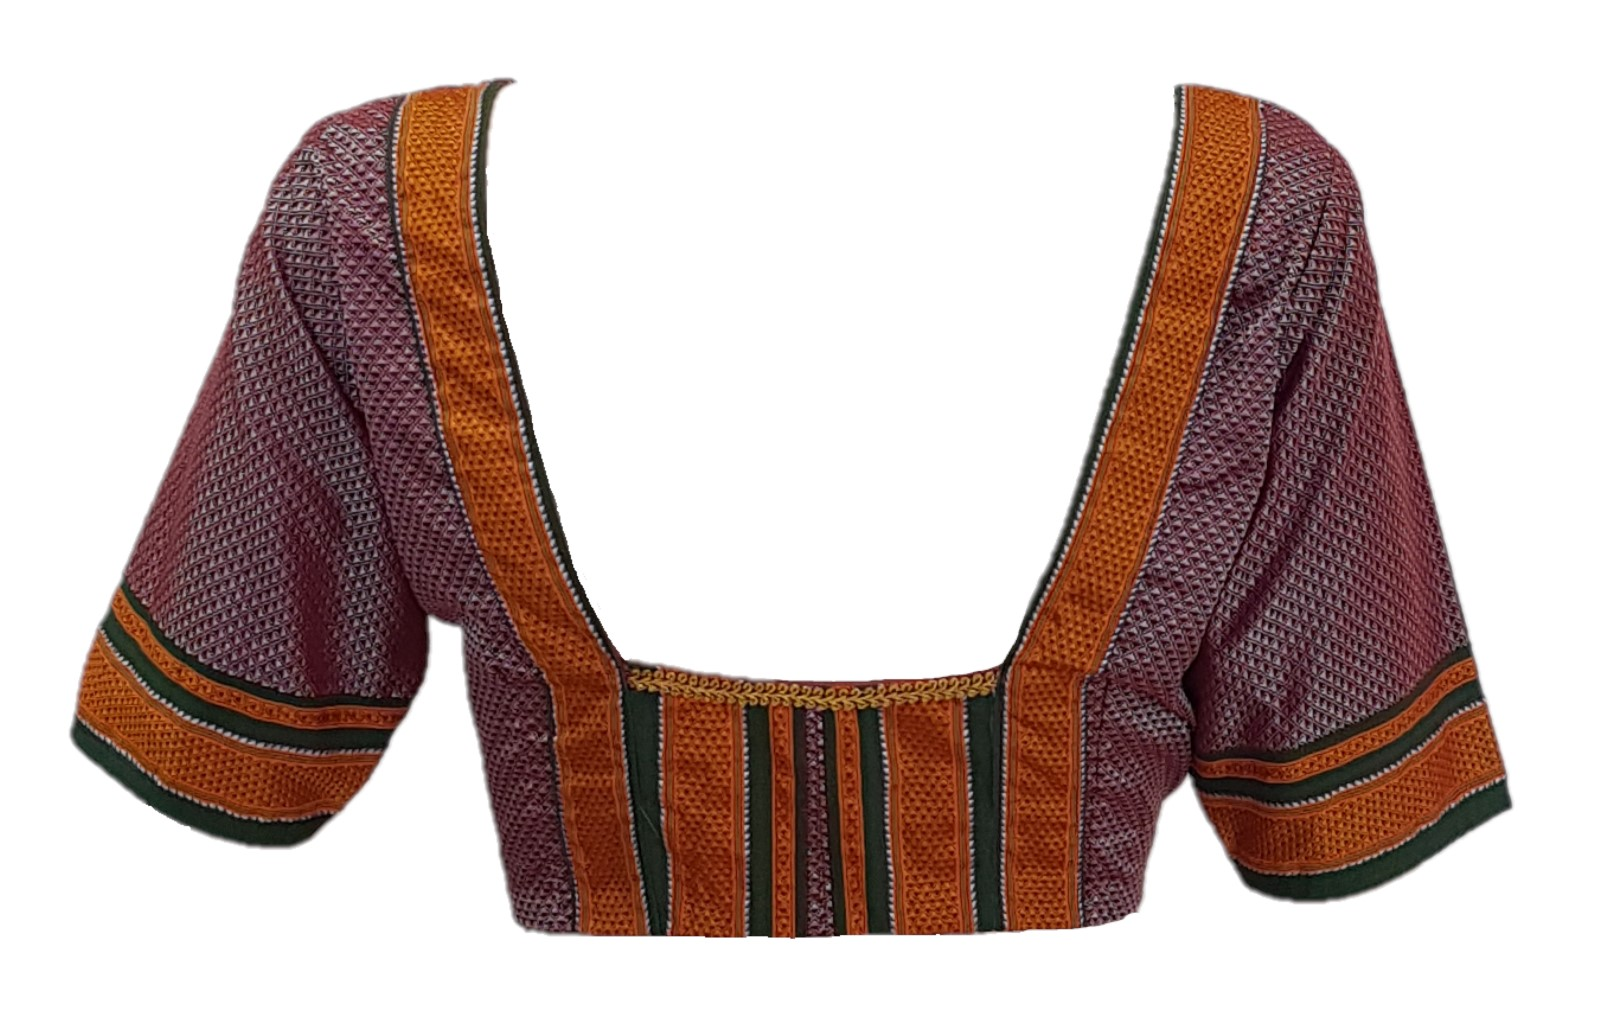 Ilkal Cotton Silk Khun Fabric Designer Back Readymade Saree Blouse Pinkish Maroon : Picture